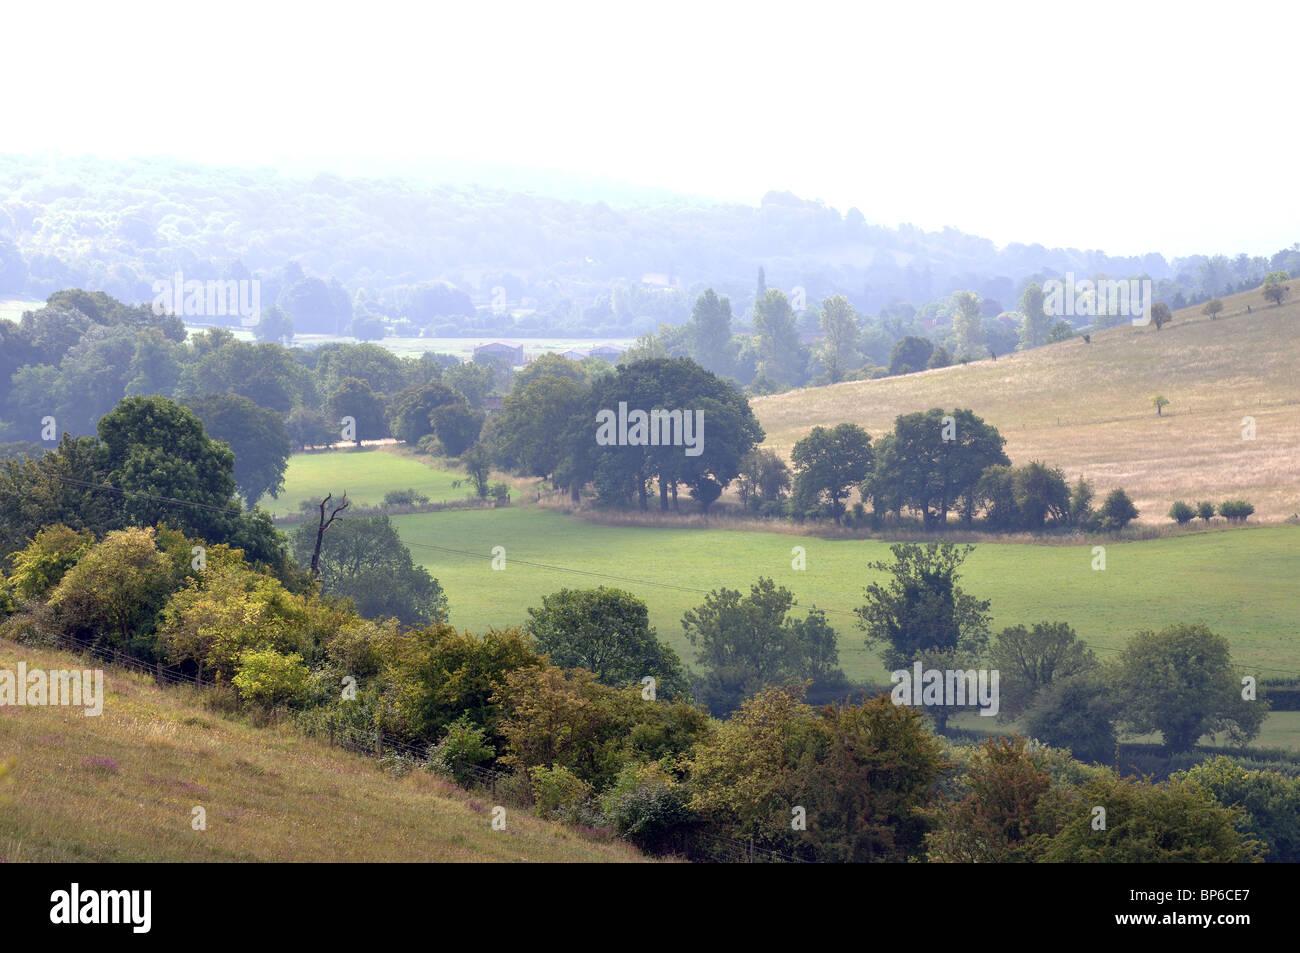 Chiltern Hills landscape near Turville, Buckinghamshire, England, UK - Stock Image